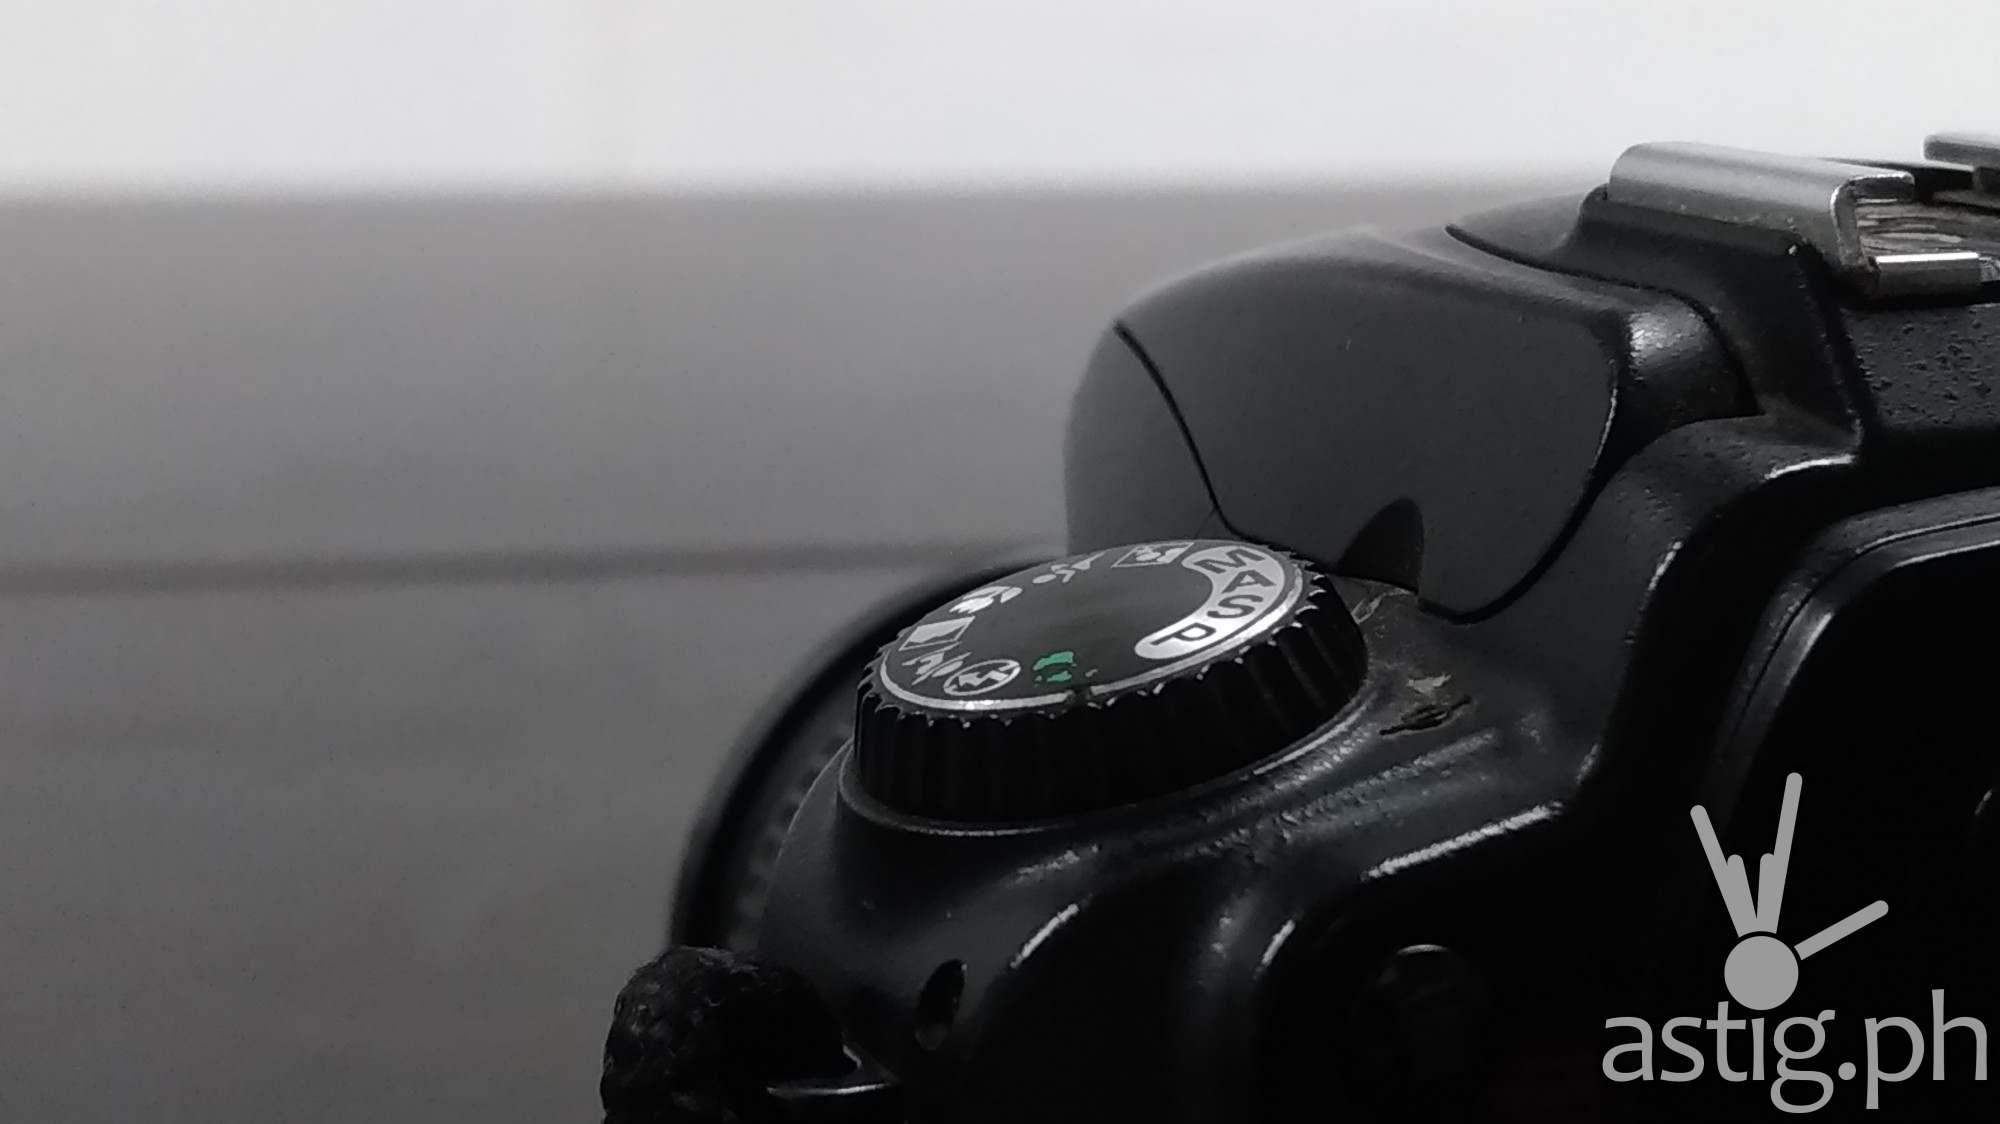 ASUS Zenfone 3 Zoom sample HDR macro (RAW unedited)